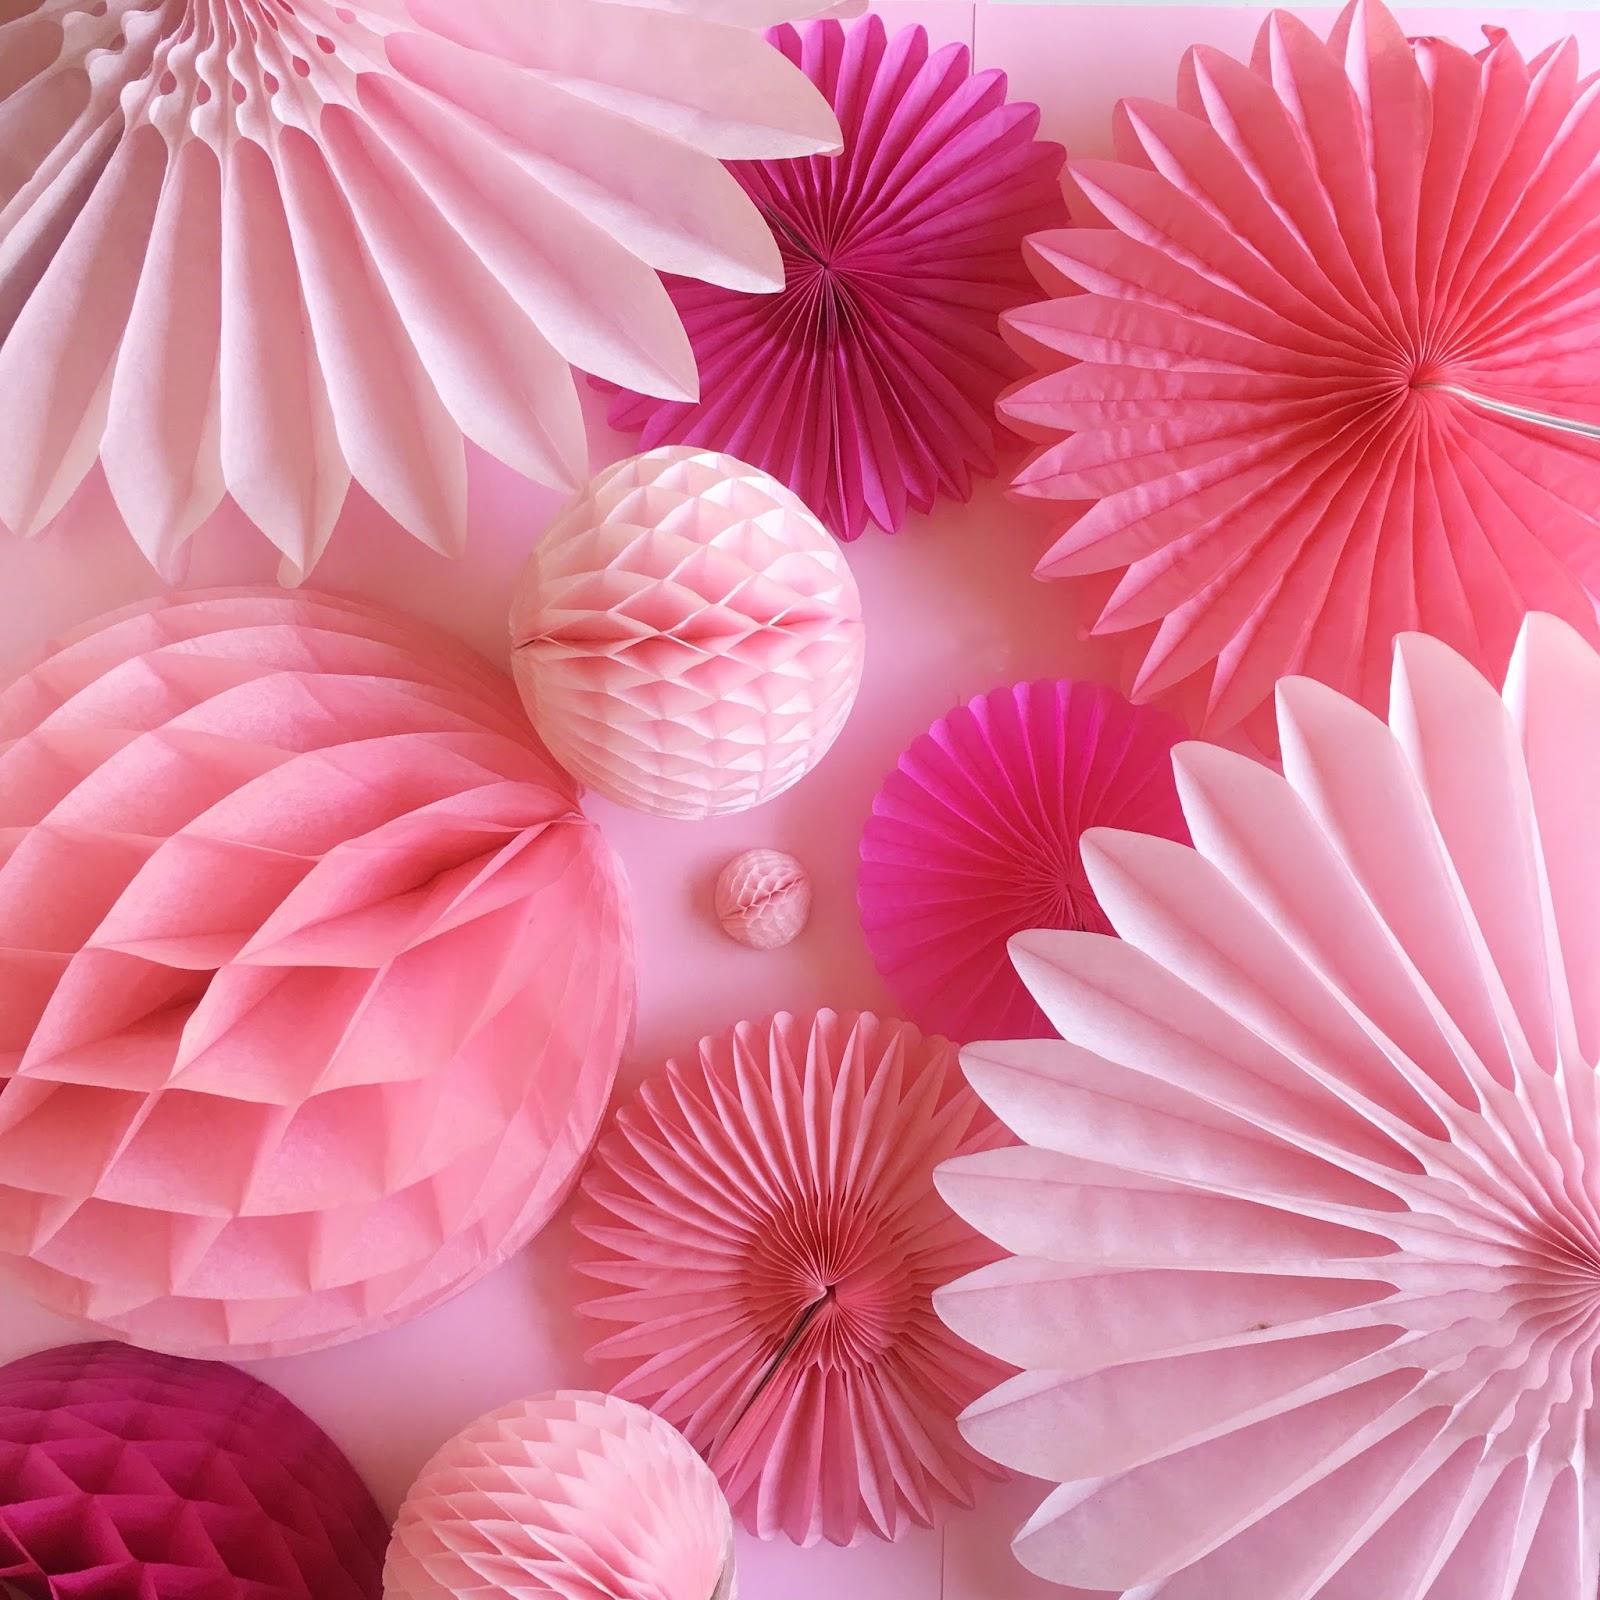 #colorsoloparami teoría del color e historia del rosa